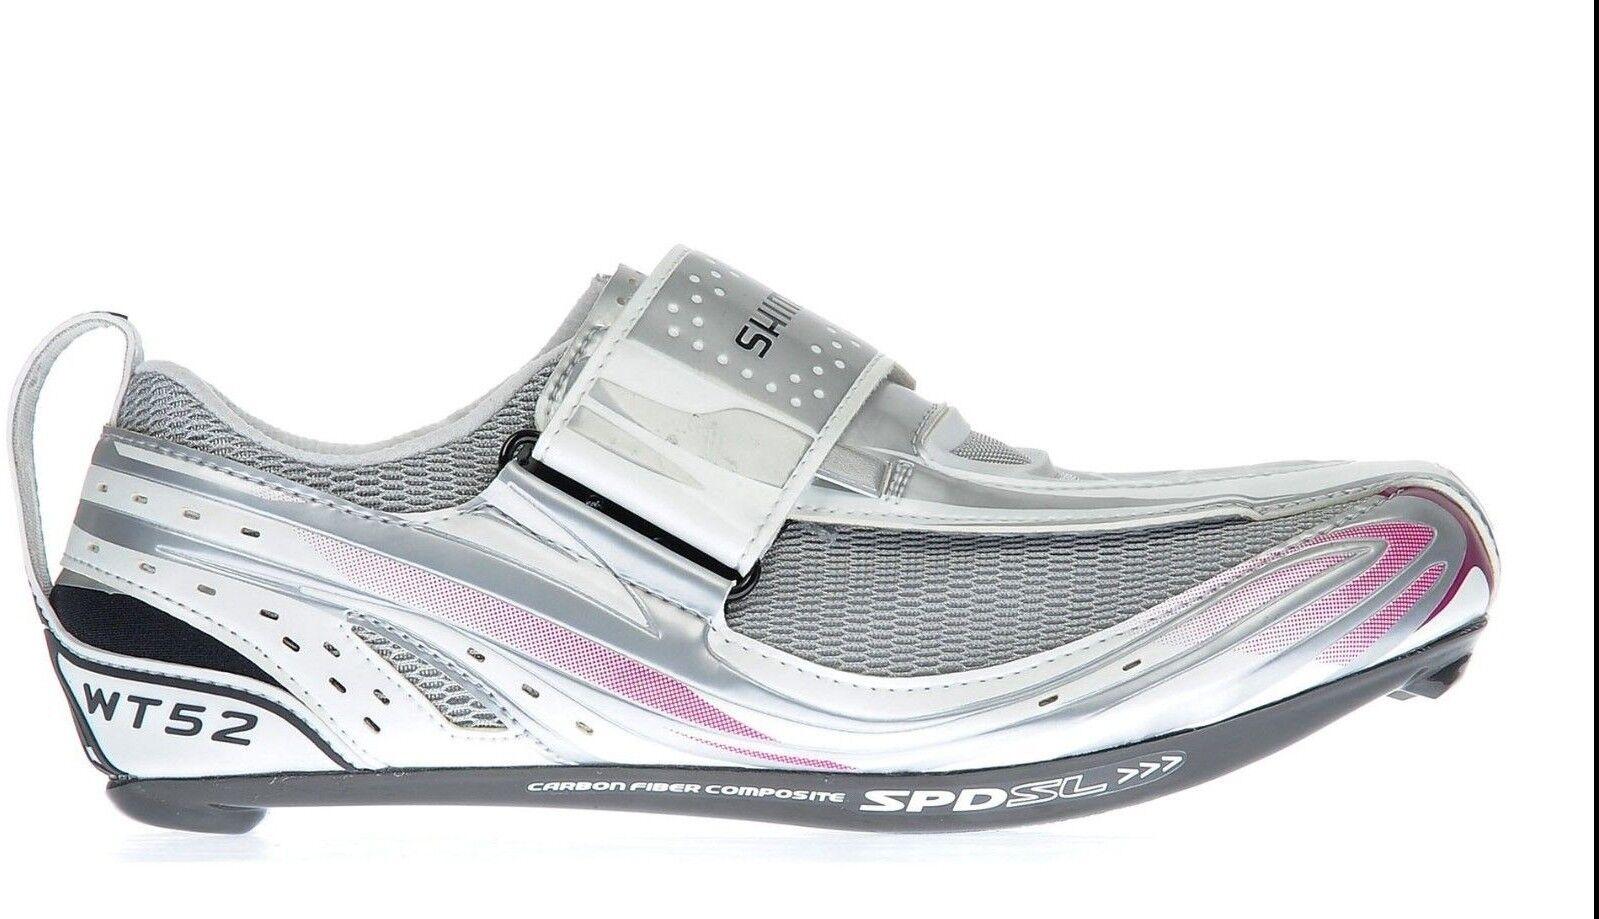 New Shimano SH-WT52 Women's SPD SL  Triathlon Carbon Cycling shoes White Purple  various sizes